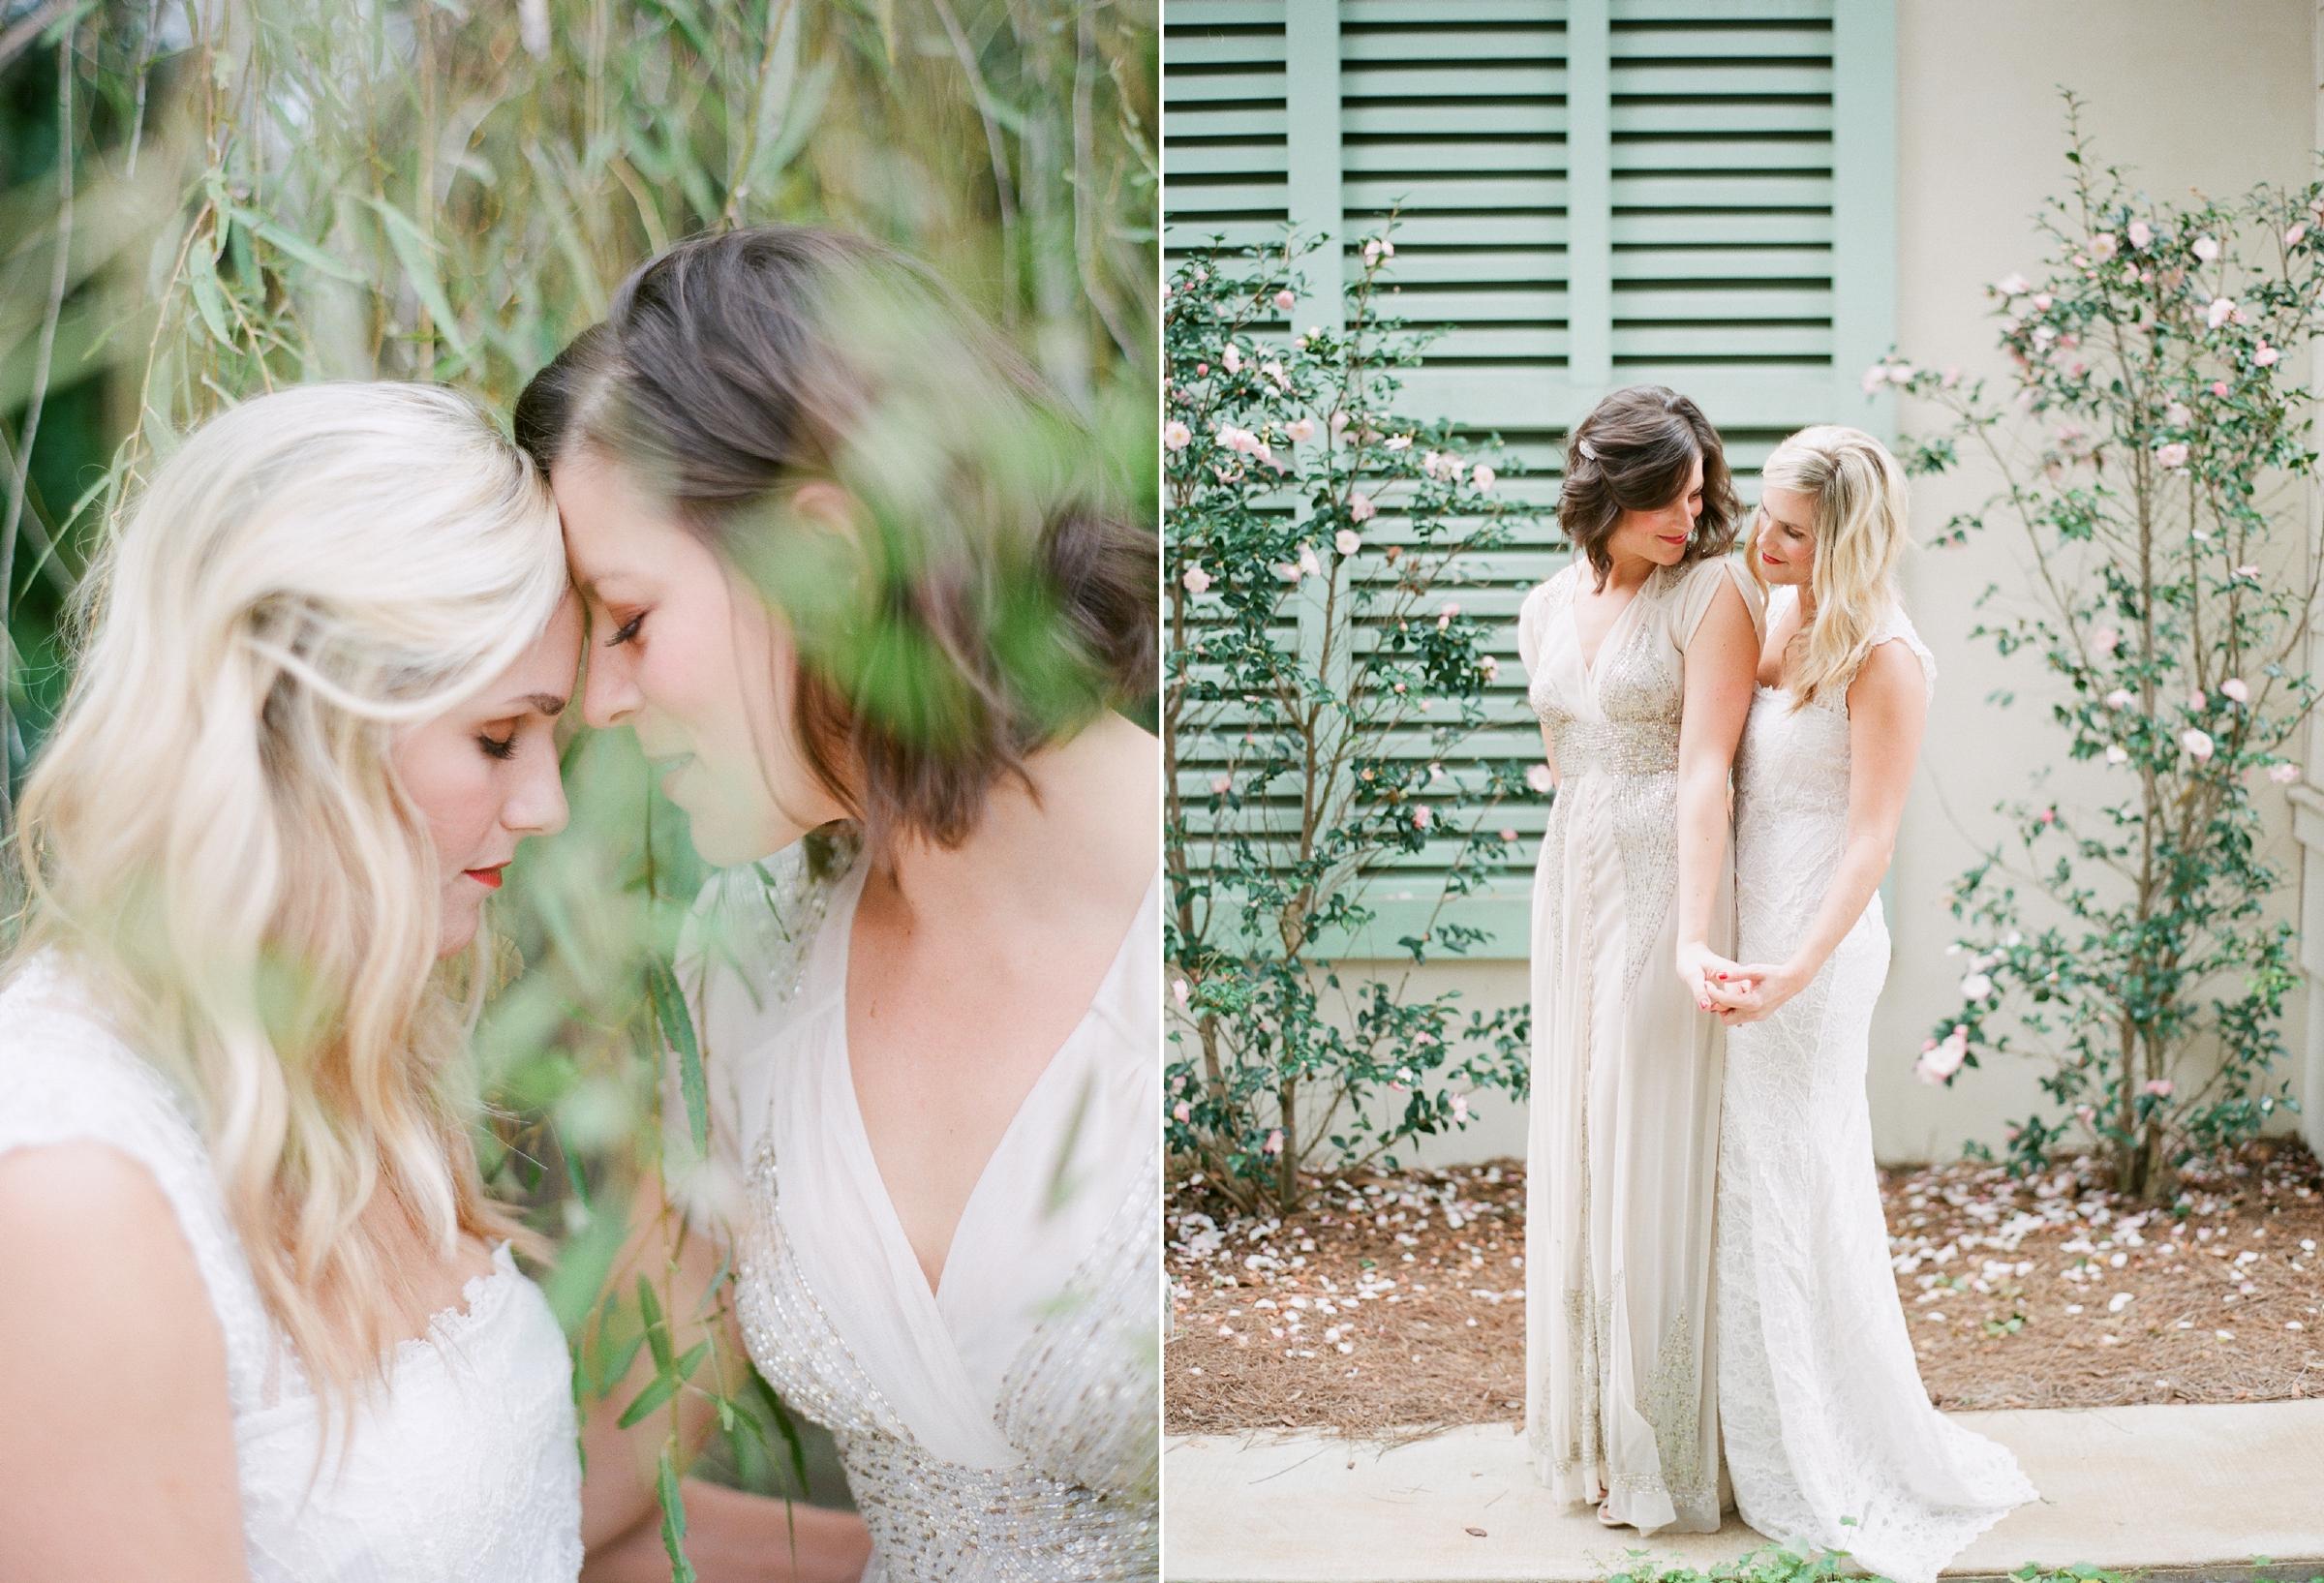 santa_rosa_beach_same_sex_wedding_photographer_shannon_griffin_0013.jpg